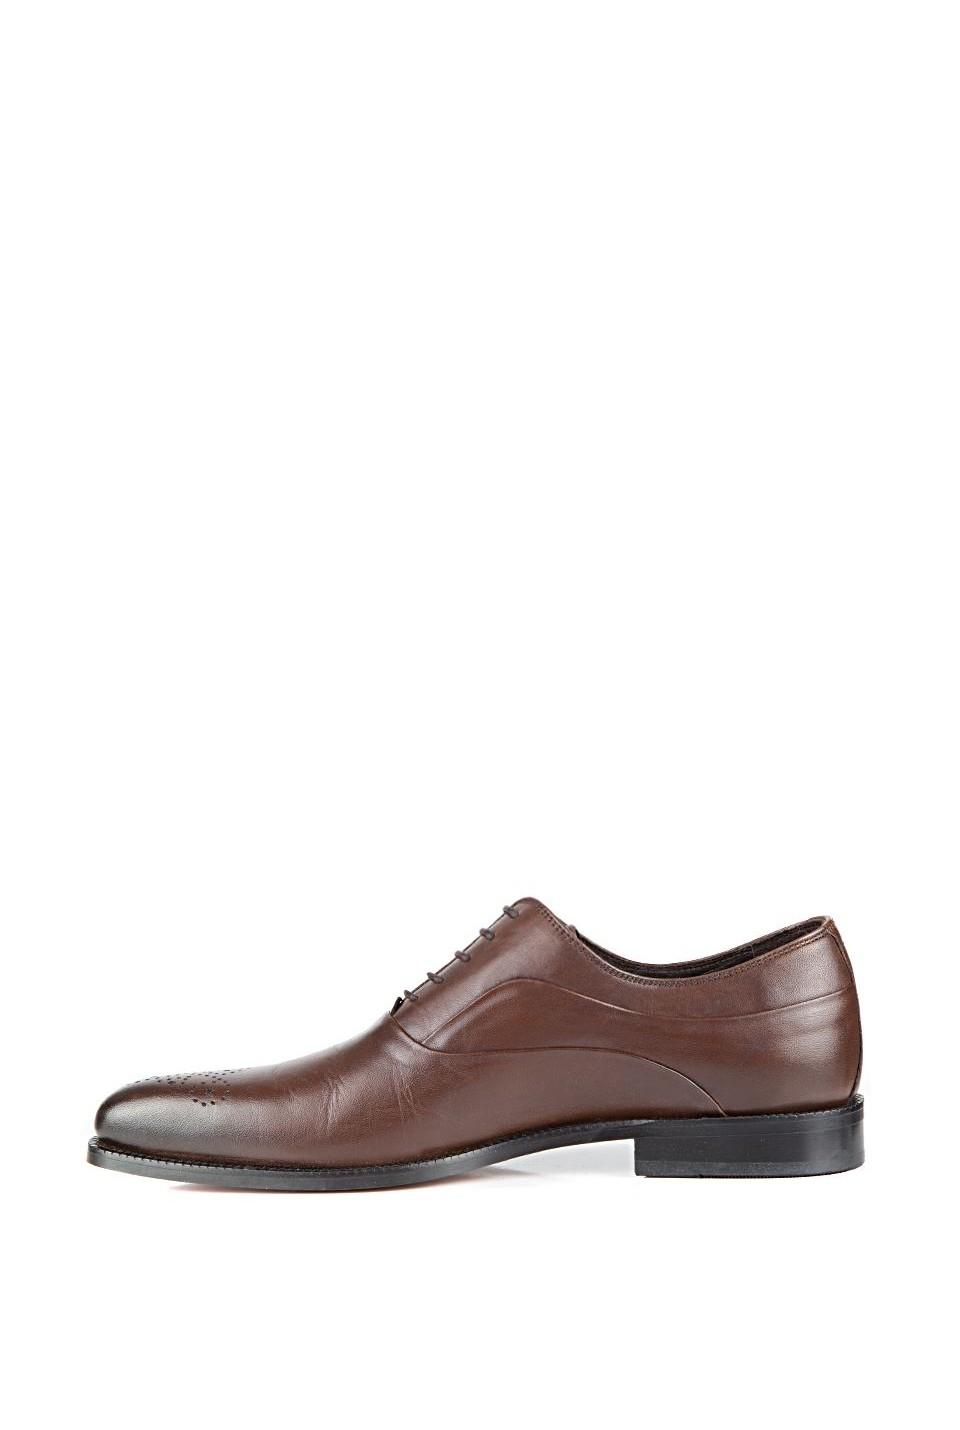 60889d736 صورة 1 من اصل 4. حذاء رجالي رسمي جلد - بني - للبيع بالجملة - دي اس دامات - DS  damat